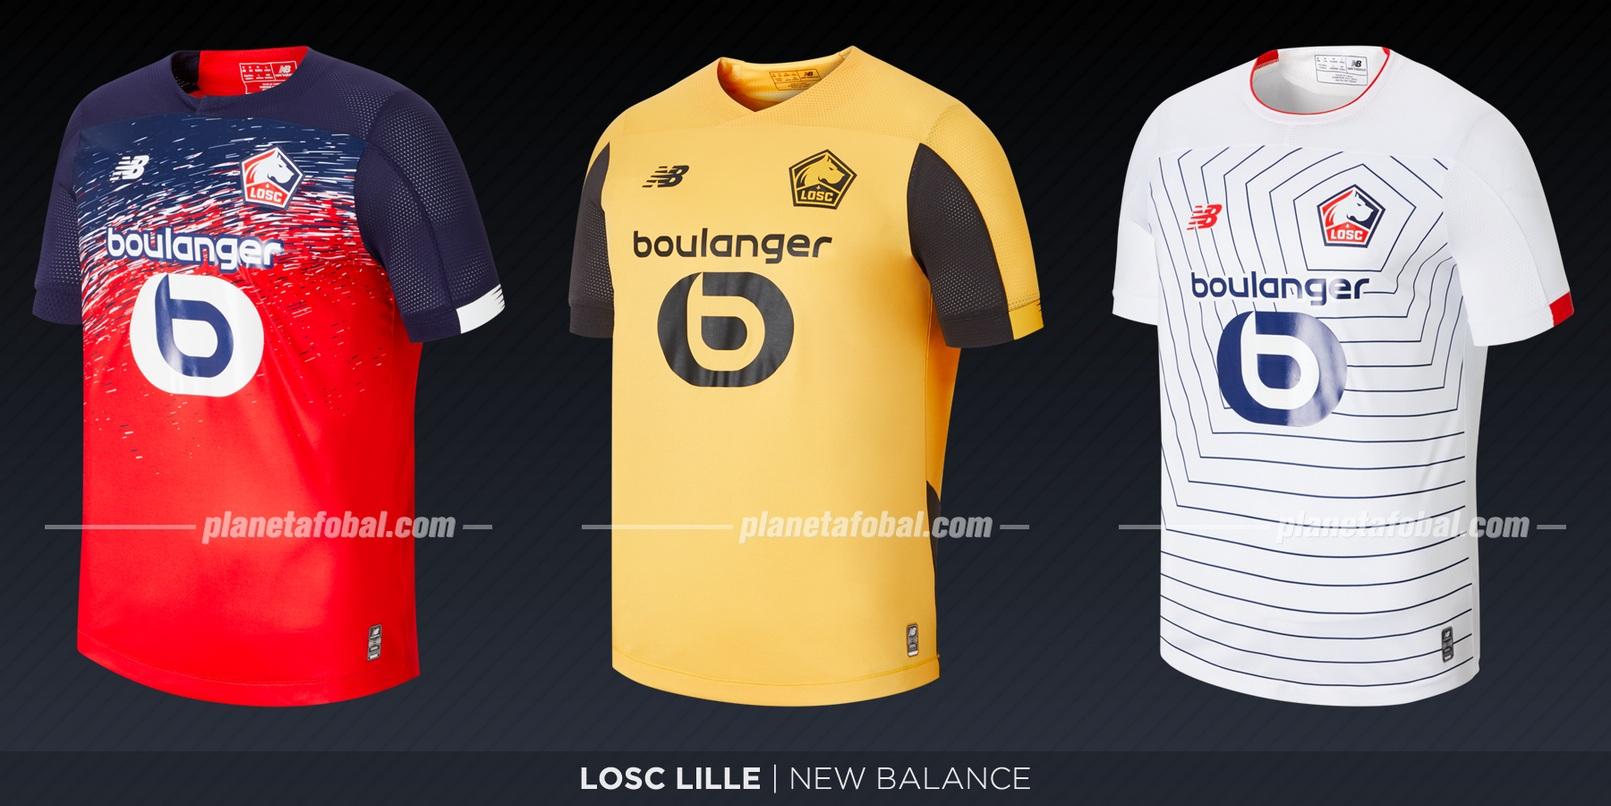 LOSC Lille (New Balance) | Camisetas de la Ligue 1 2019-2020